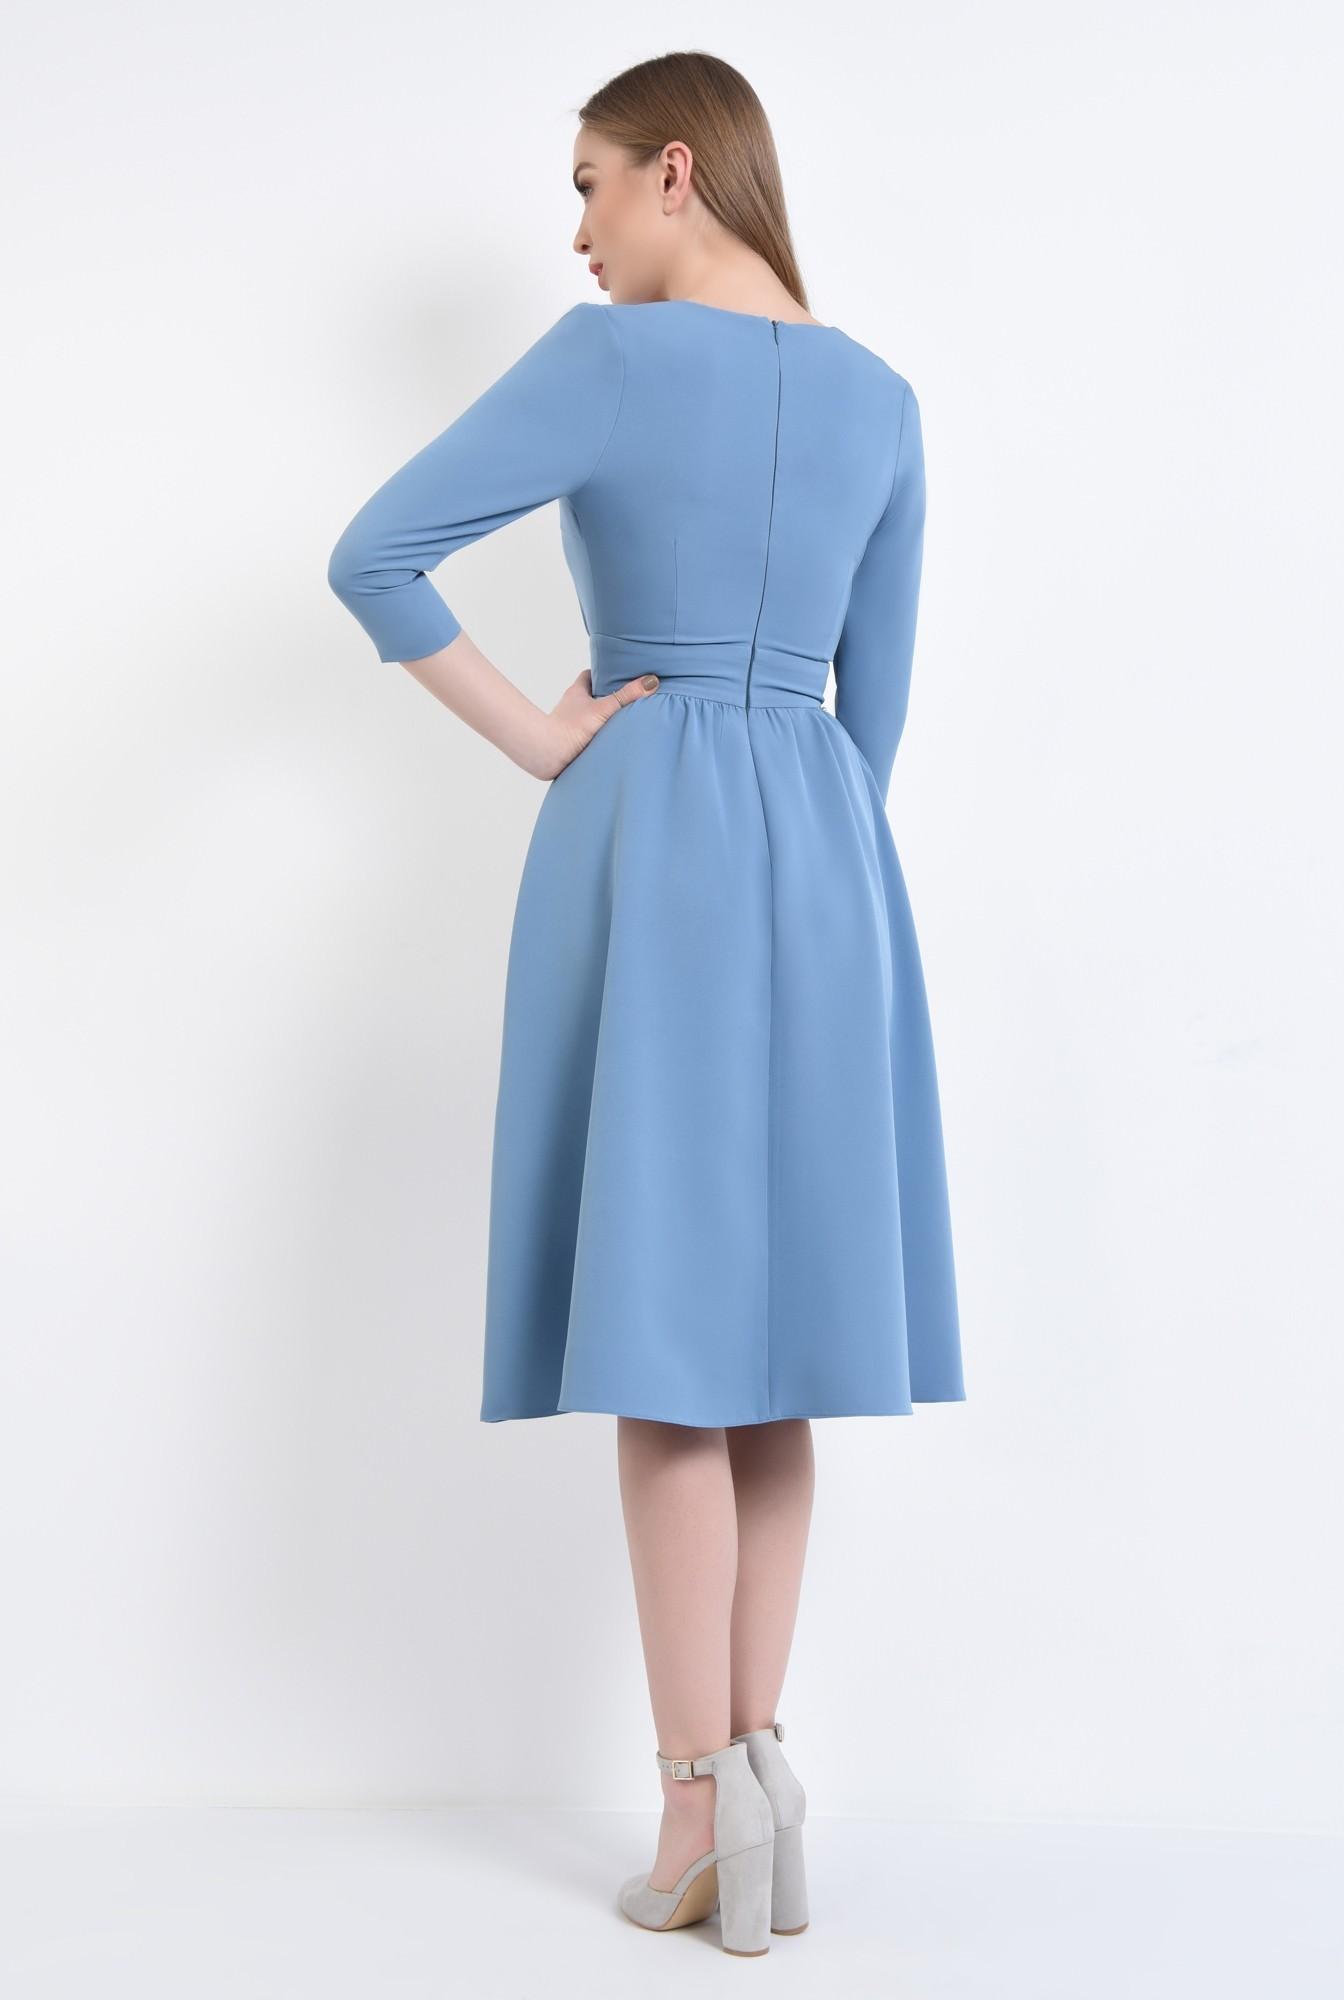 1 - 360 - Rochie de zi, bleu